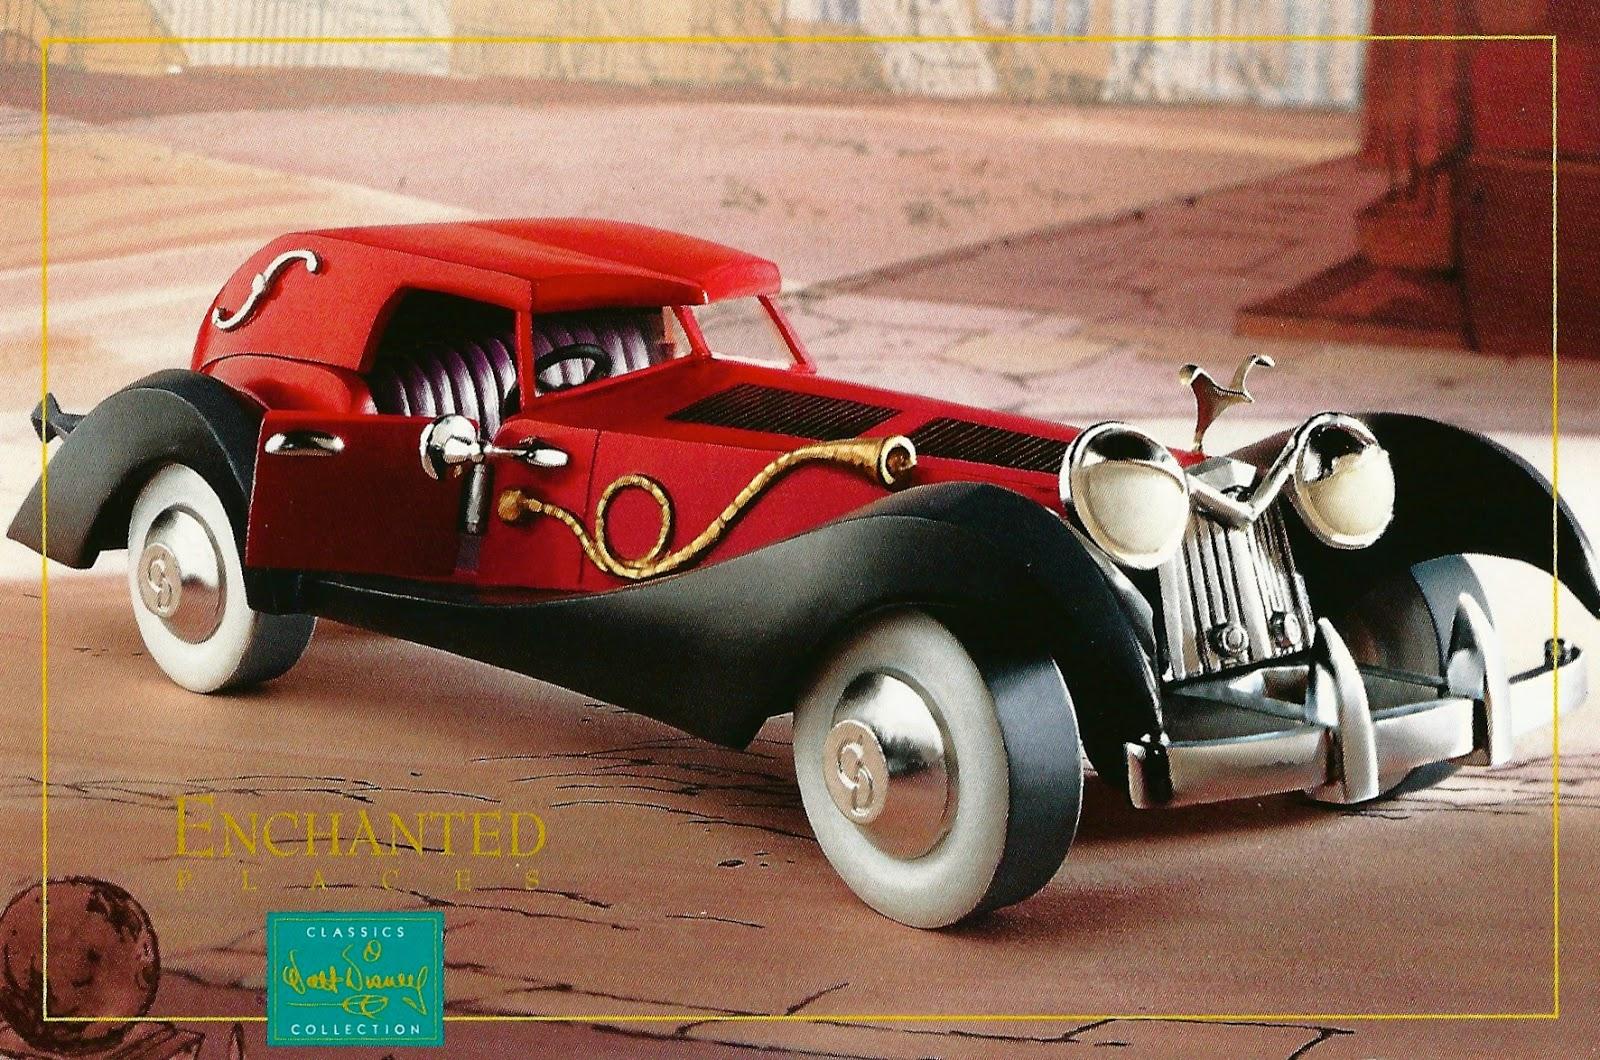 My Favorite Disney Postcards: Cruella DeVil's Car